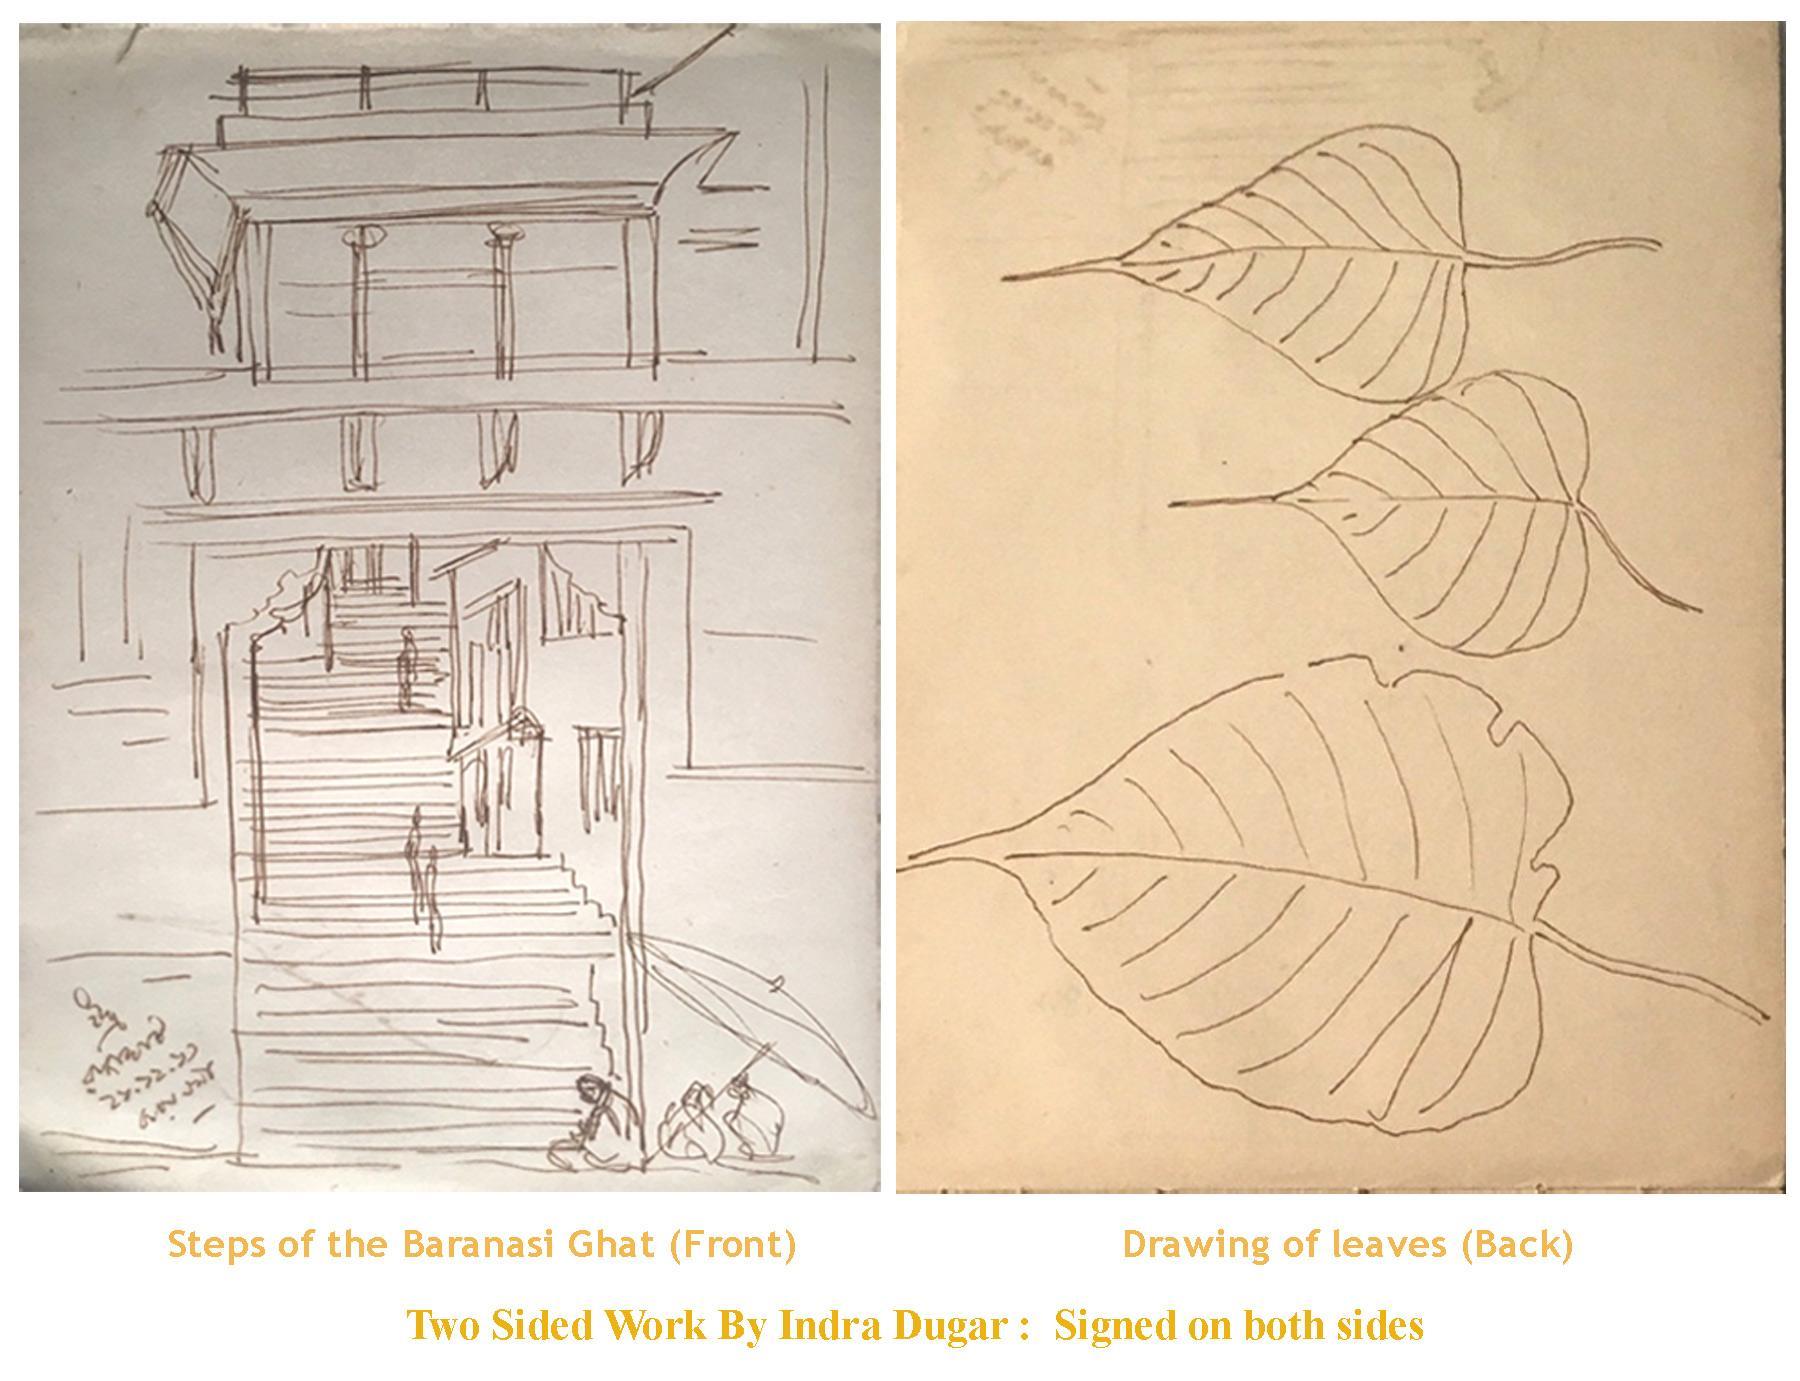 BaranasiGhat, Ink on paper by Indra Dugar,inspired by Master Artist NandalalBose